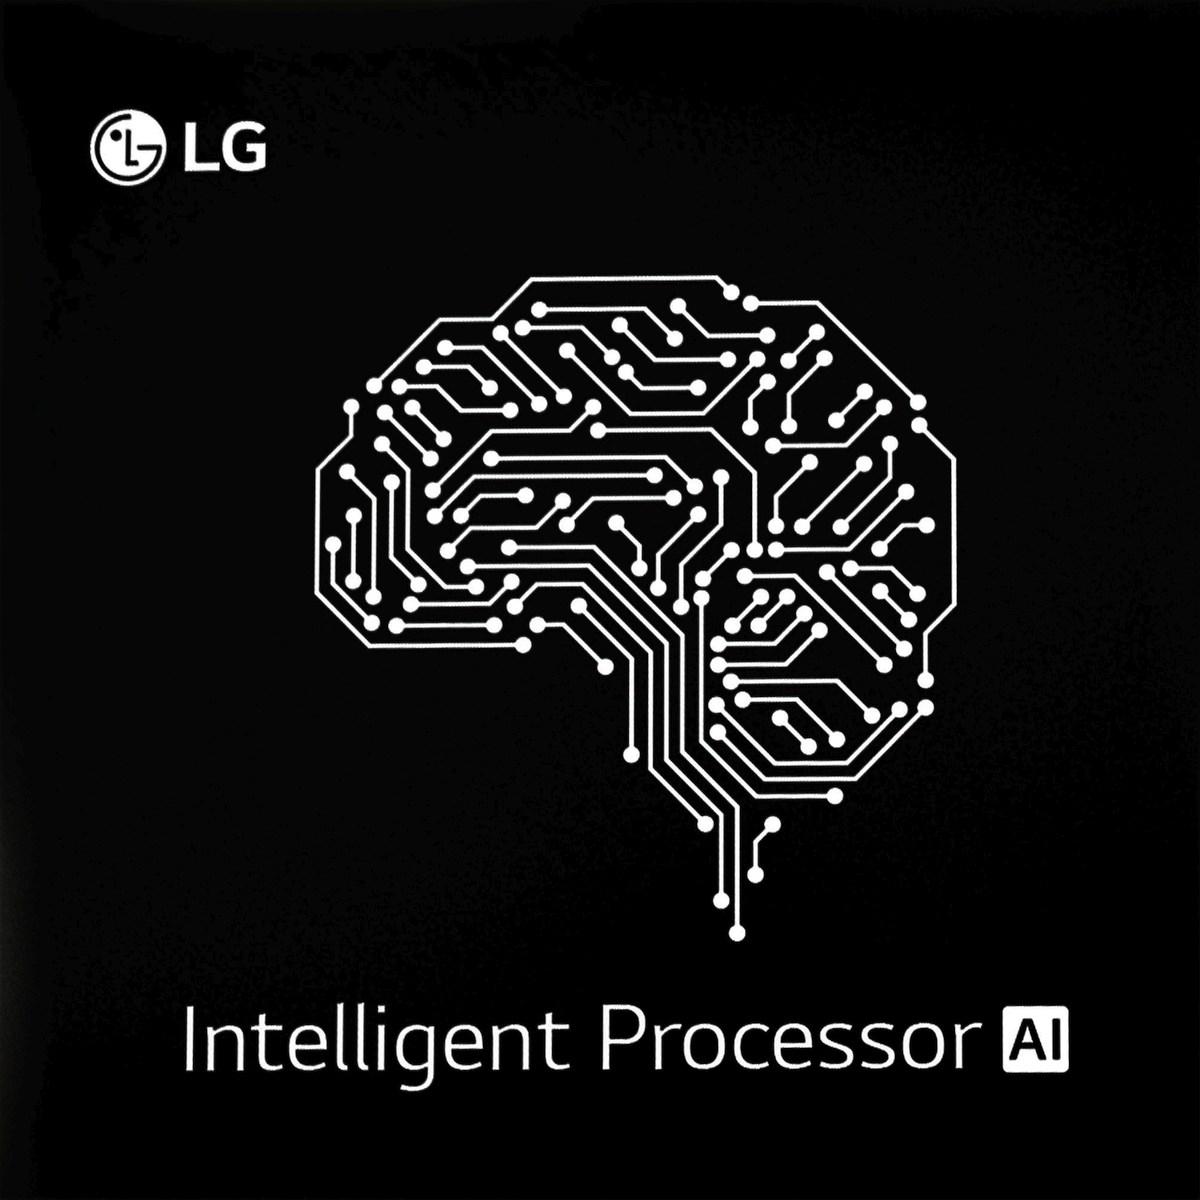 LG AI Chip Image